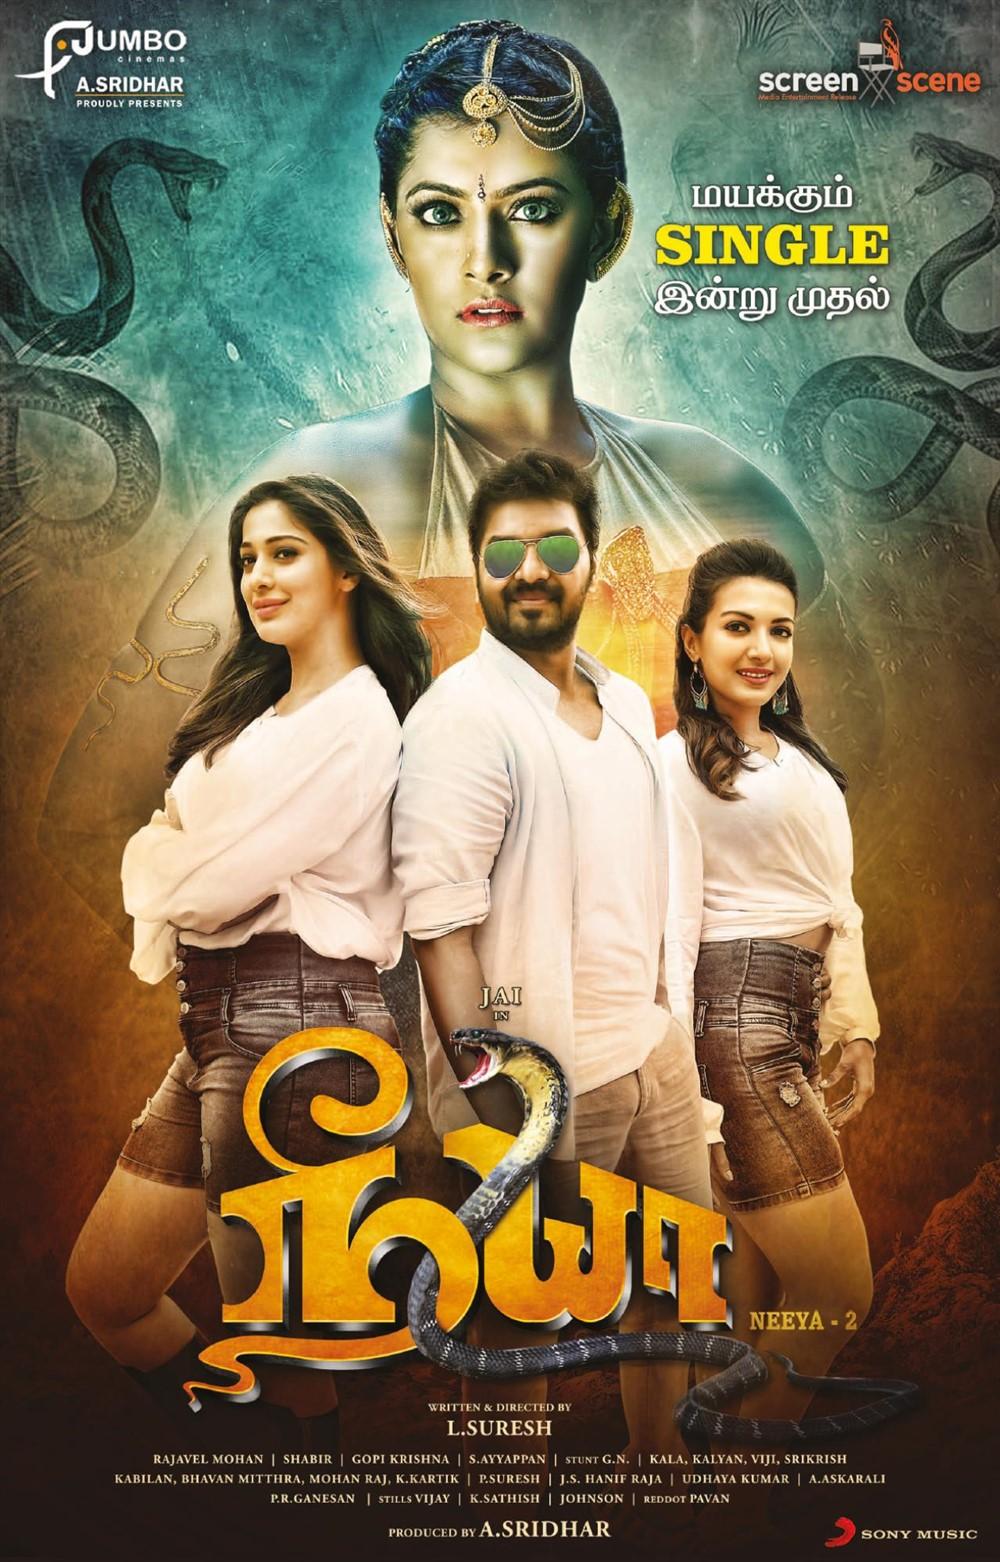 Jai, Varalaxmi, Catherine Tresa, Raai Laxmi Neeya 2 First Single Release Today Poster